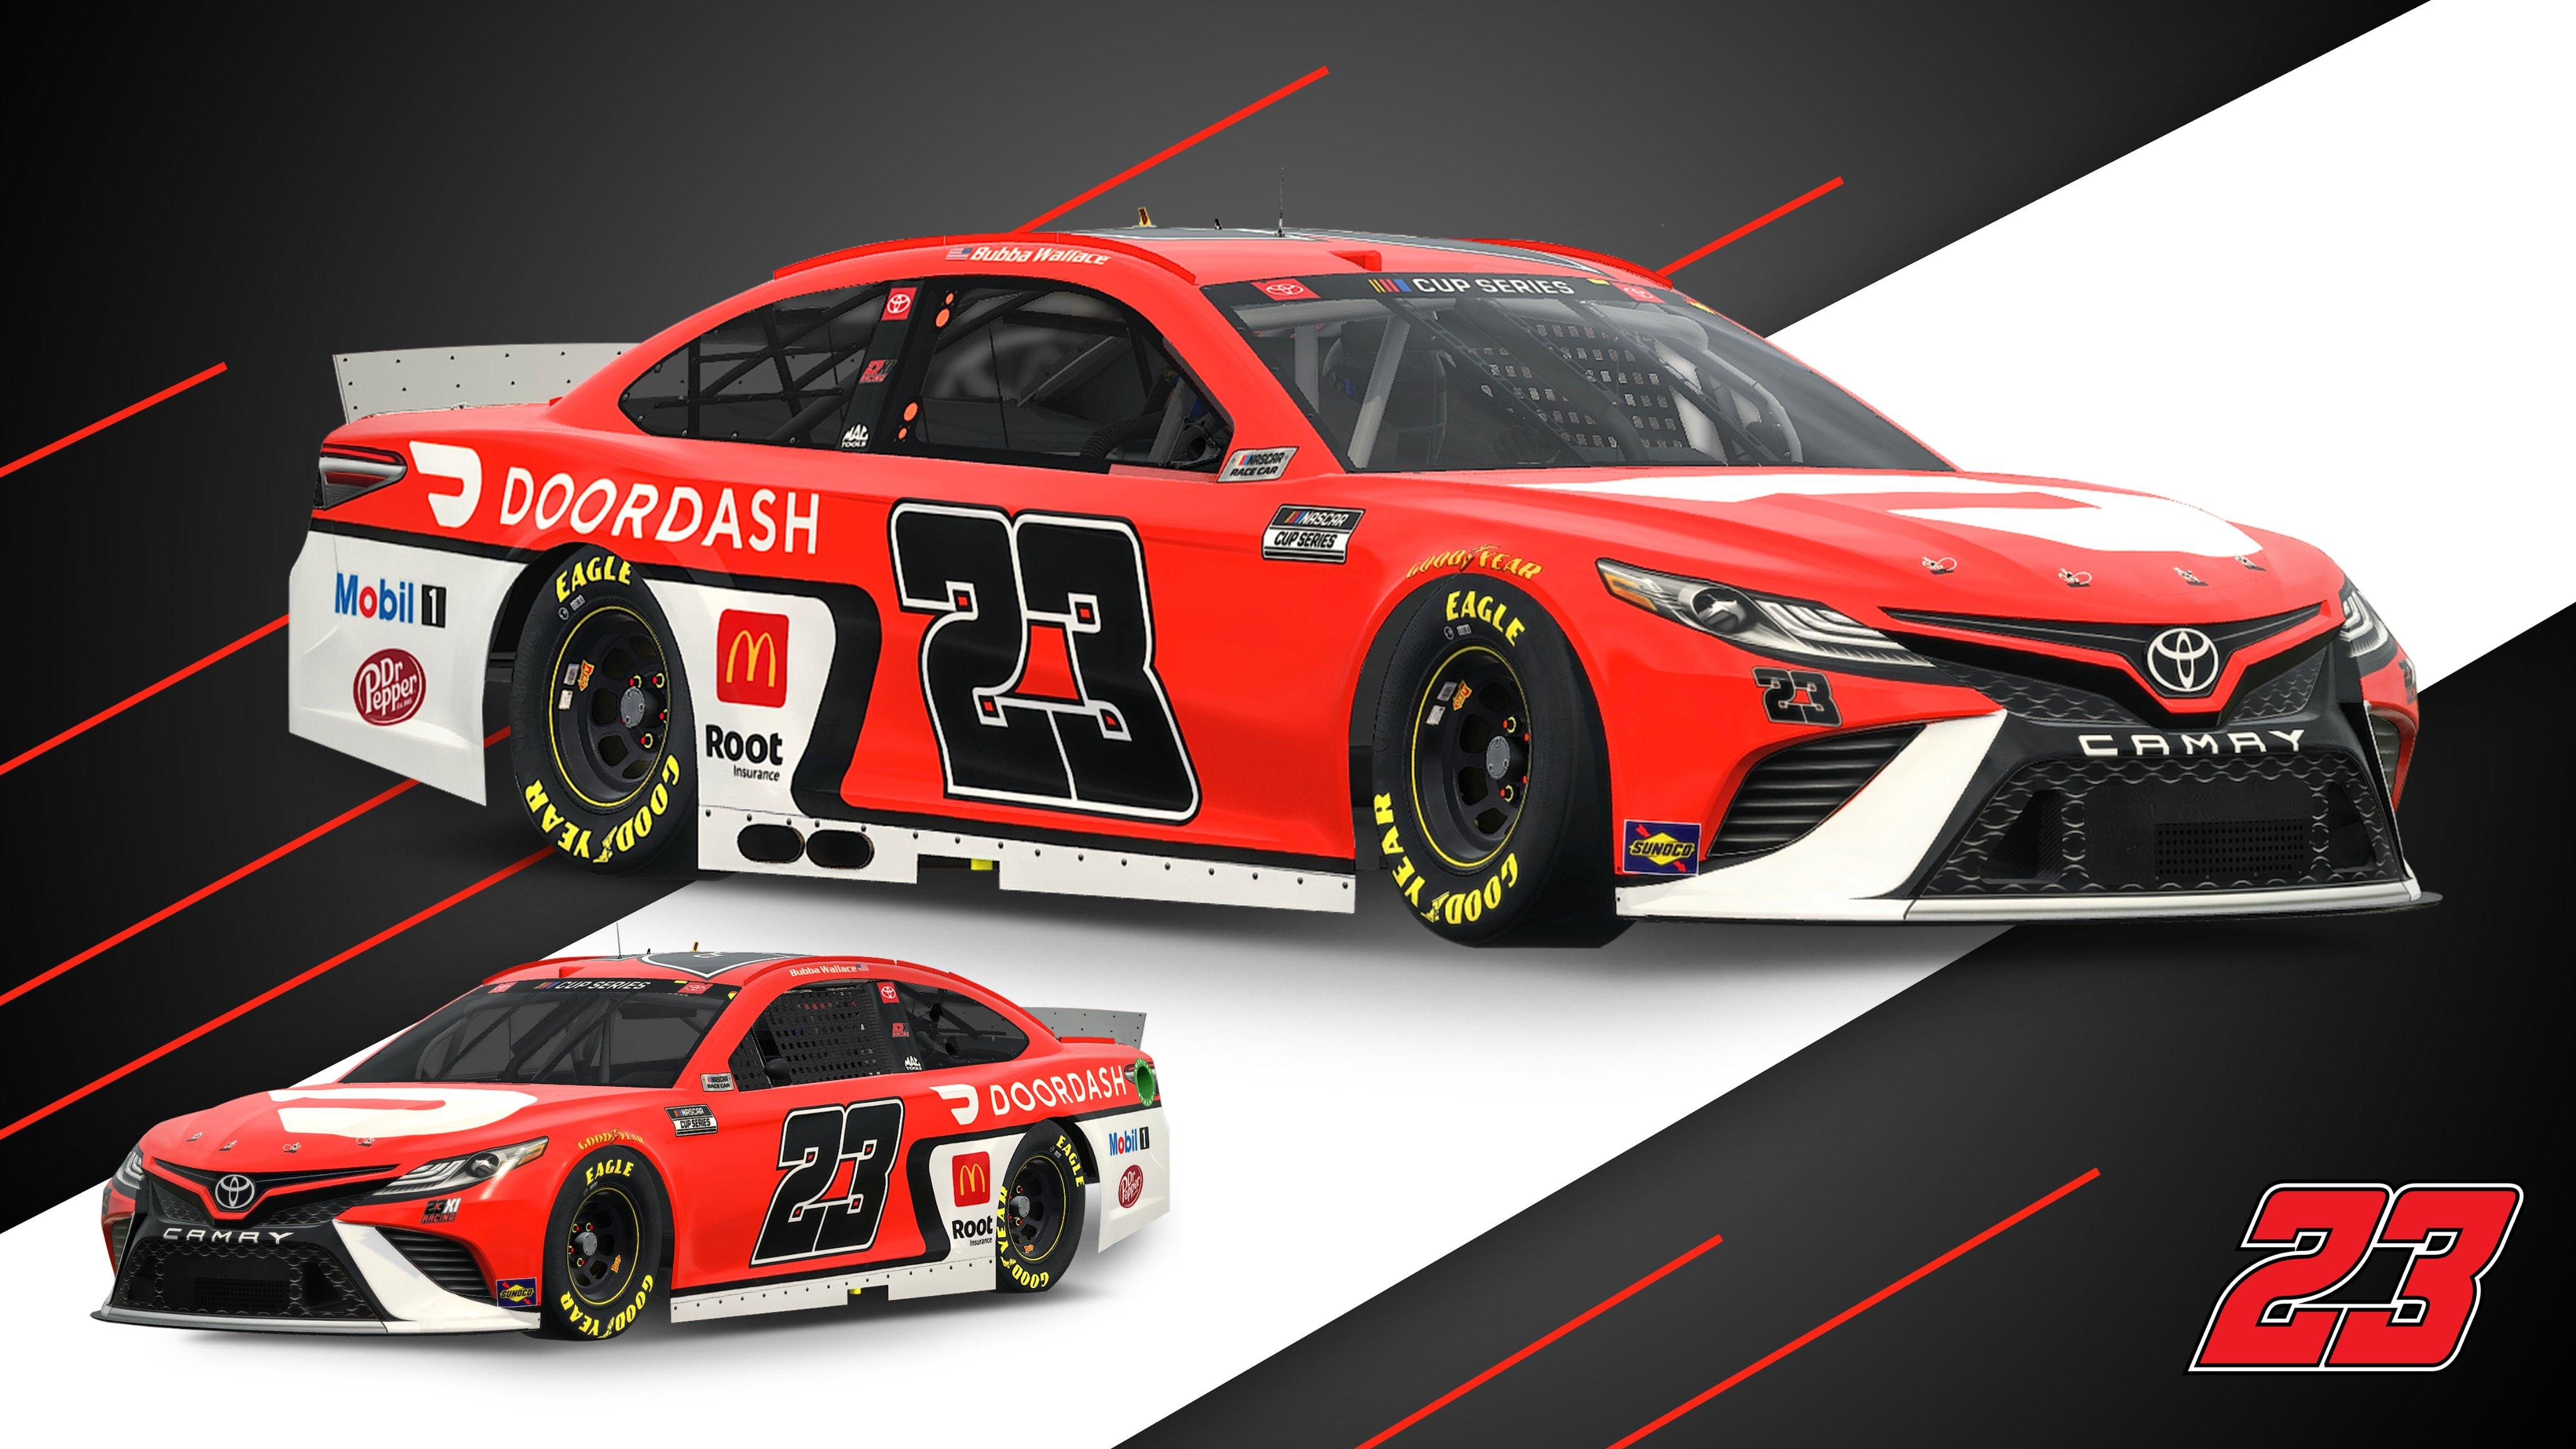 23XI Racing - Bubba Wallace 2021 car